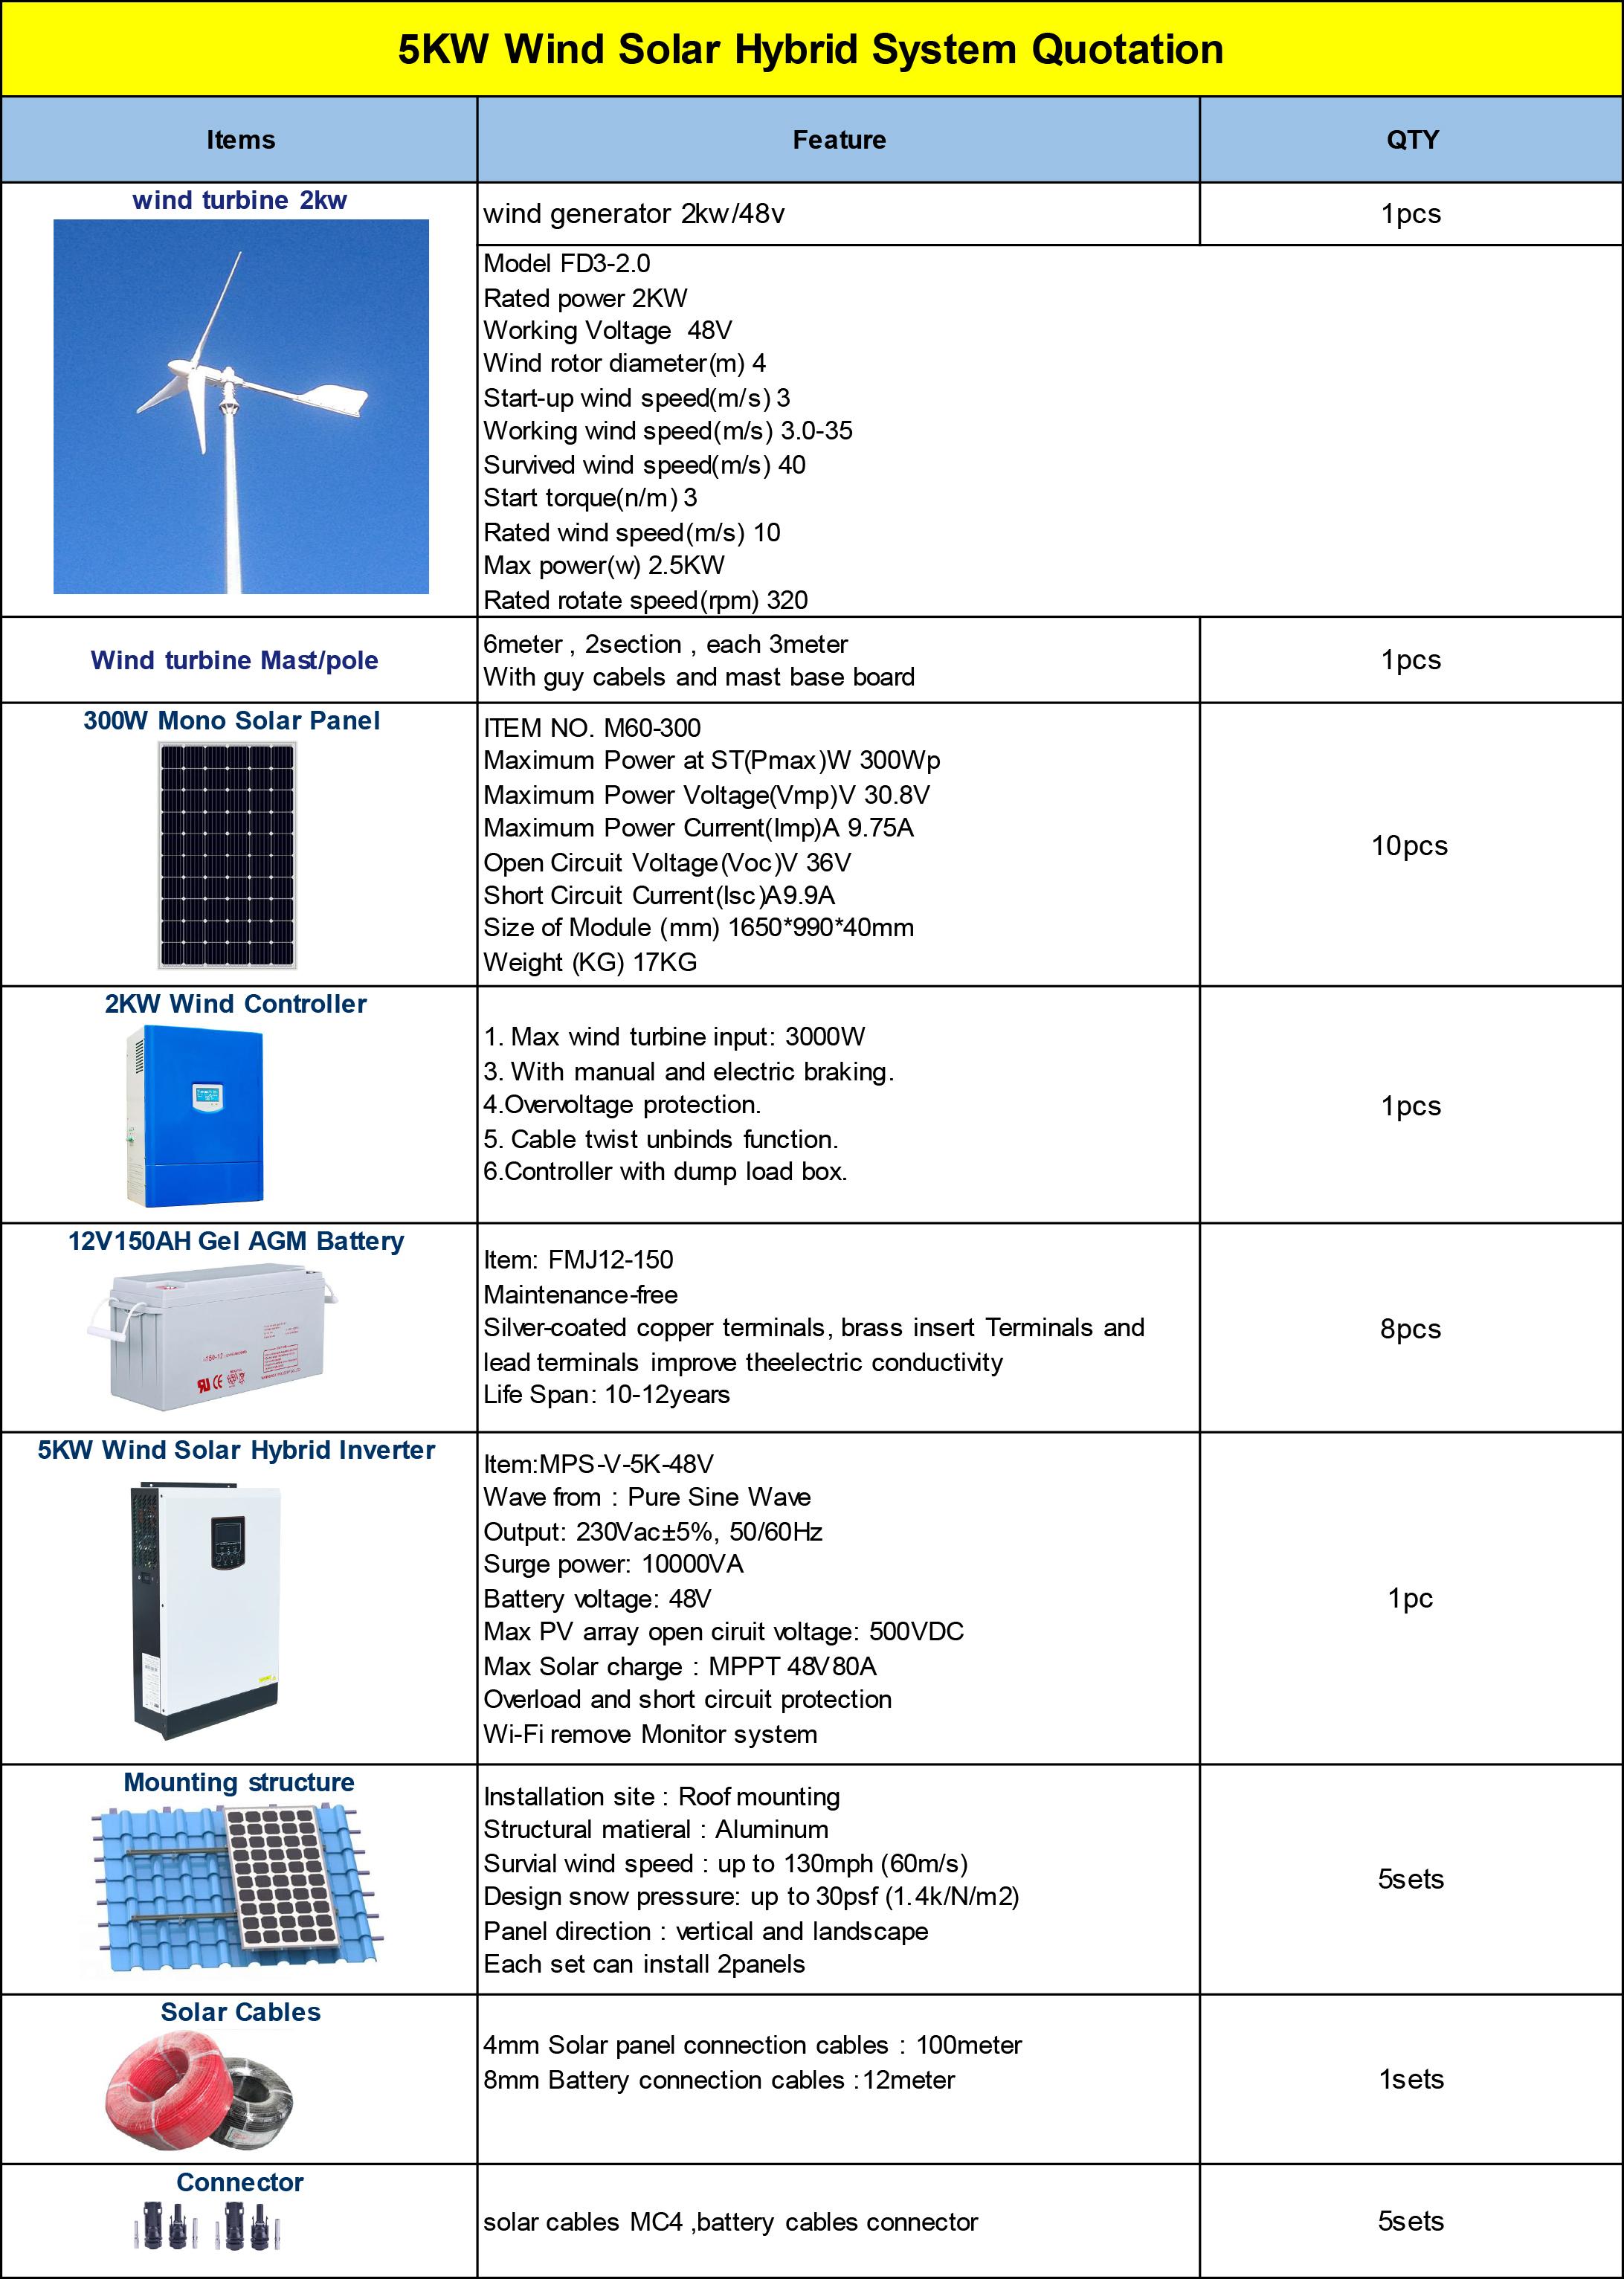 5KW WIND Turbine สำหรับใช้ลมกังหันเครื่องกำเนิดไฟฟ้าพลังงานแสงอาทิตย์/กังหันลม